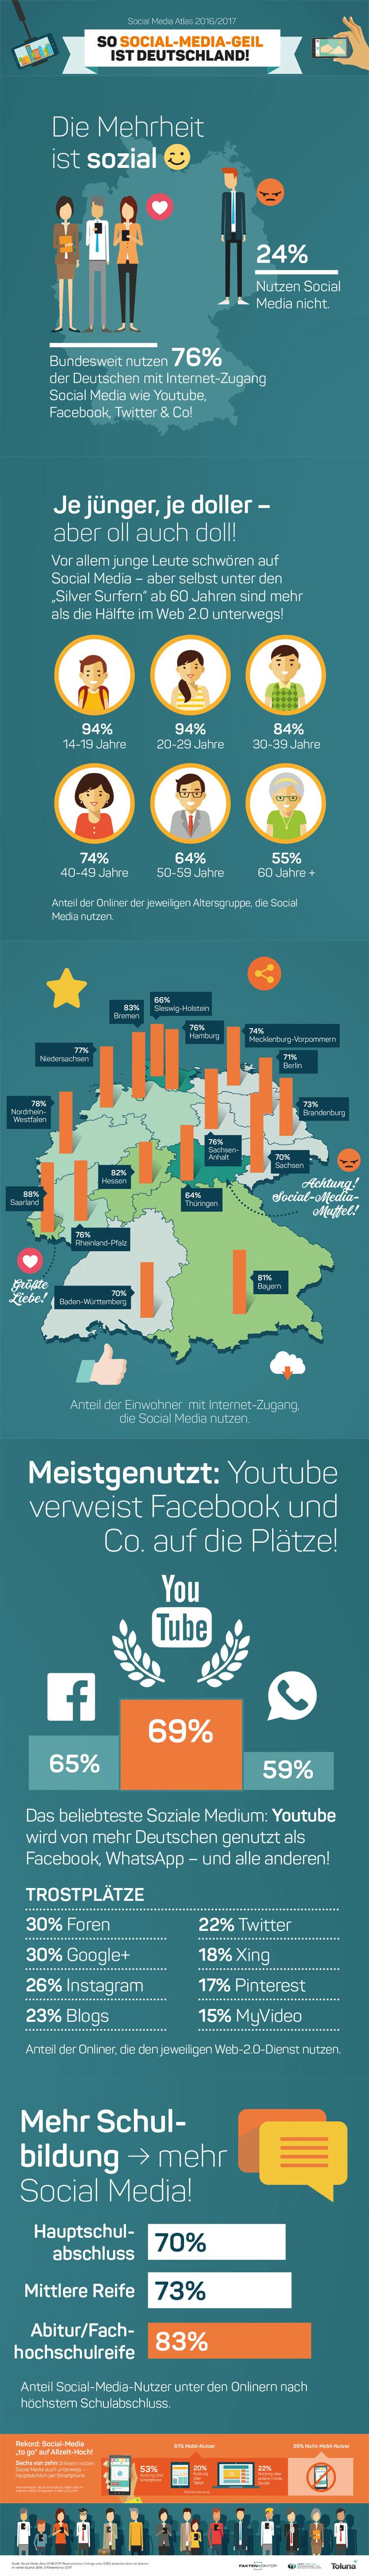 Infografik Social Media Nutzung in Deutschland